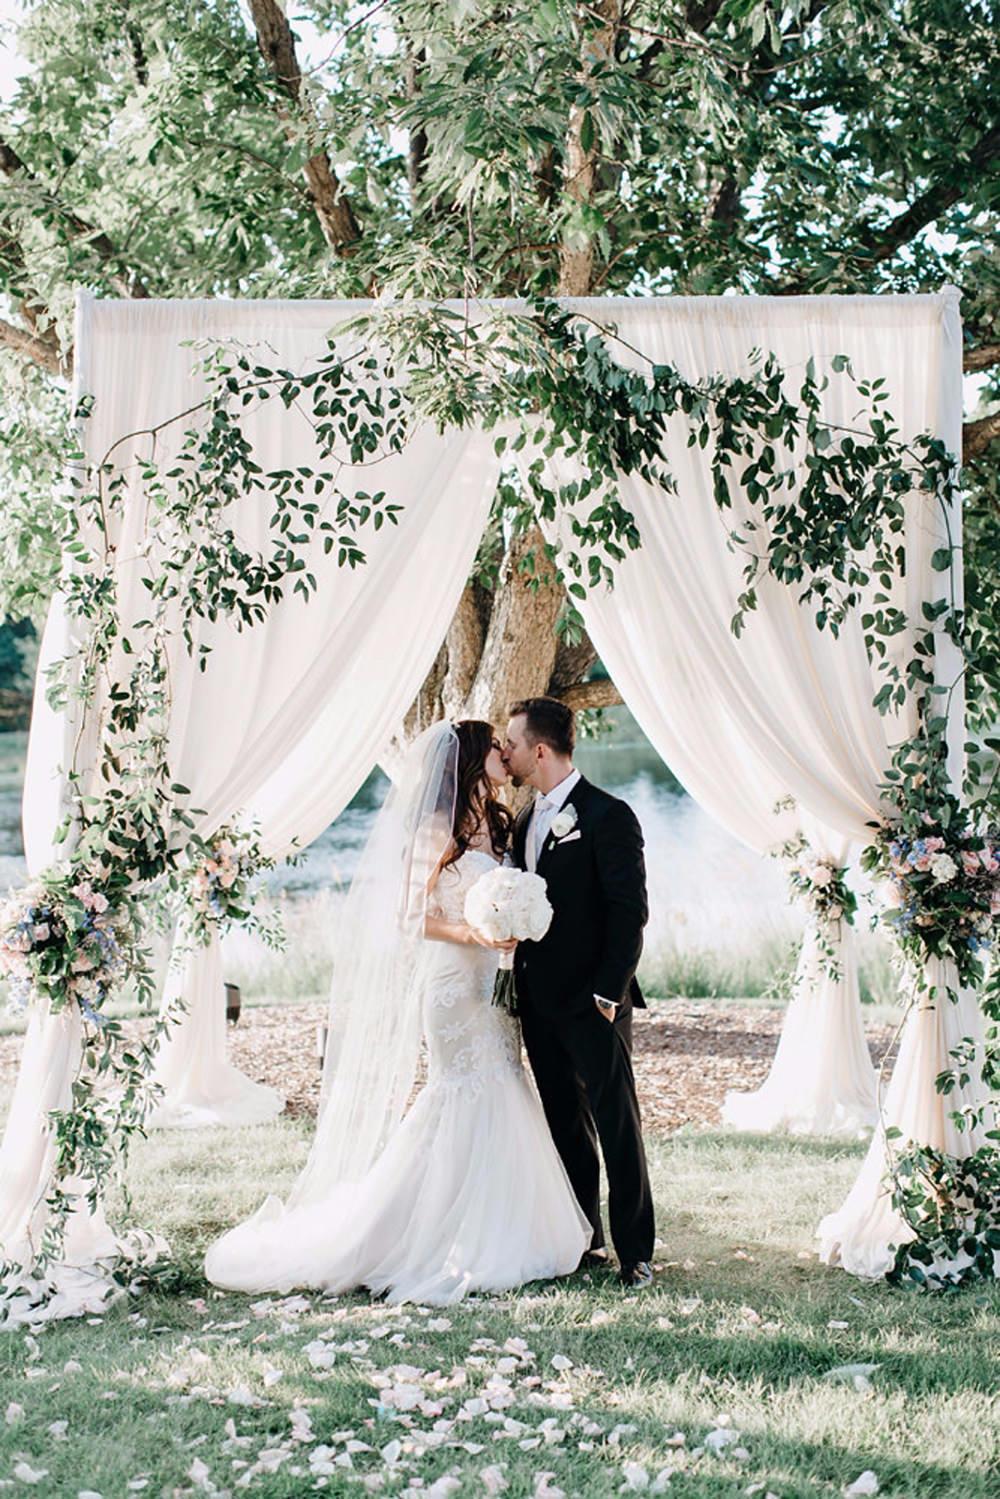 Romantic pastel garden wedding ruffled romantic pastel garden wedding photo by codrean photography httpsruffledblog junglespirit Image collections